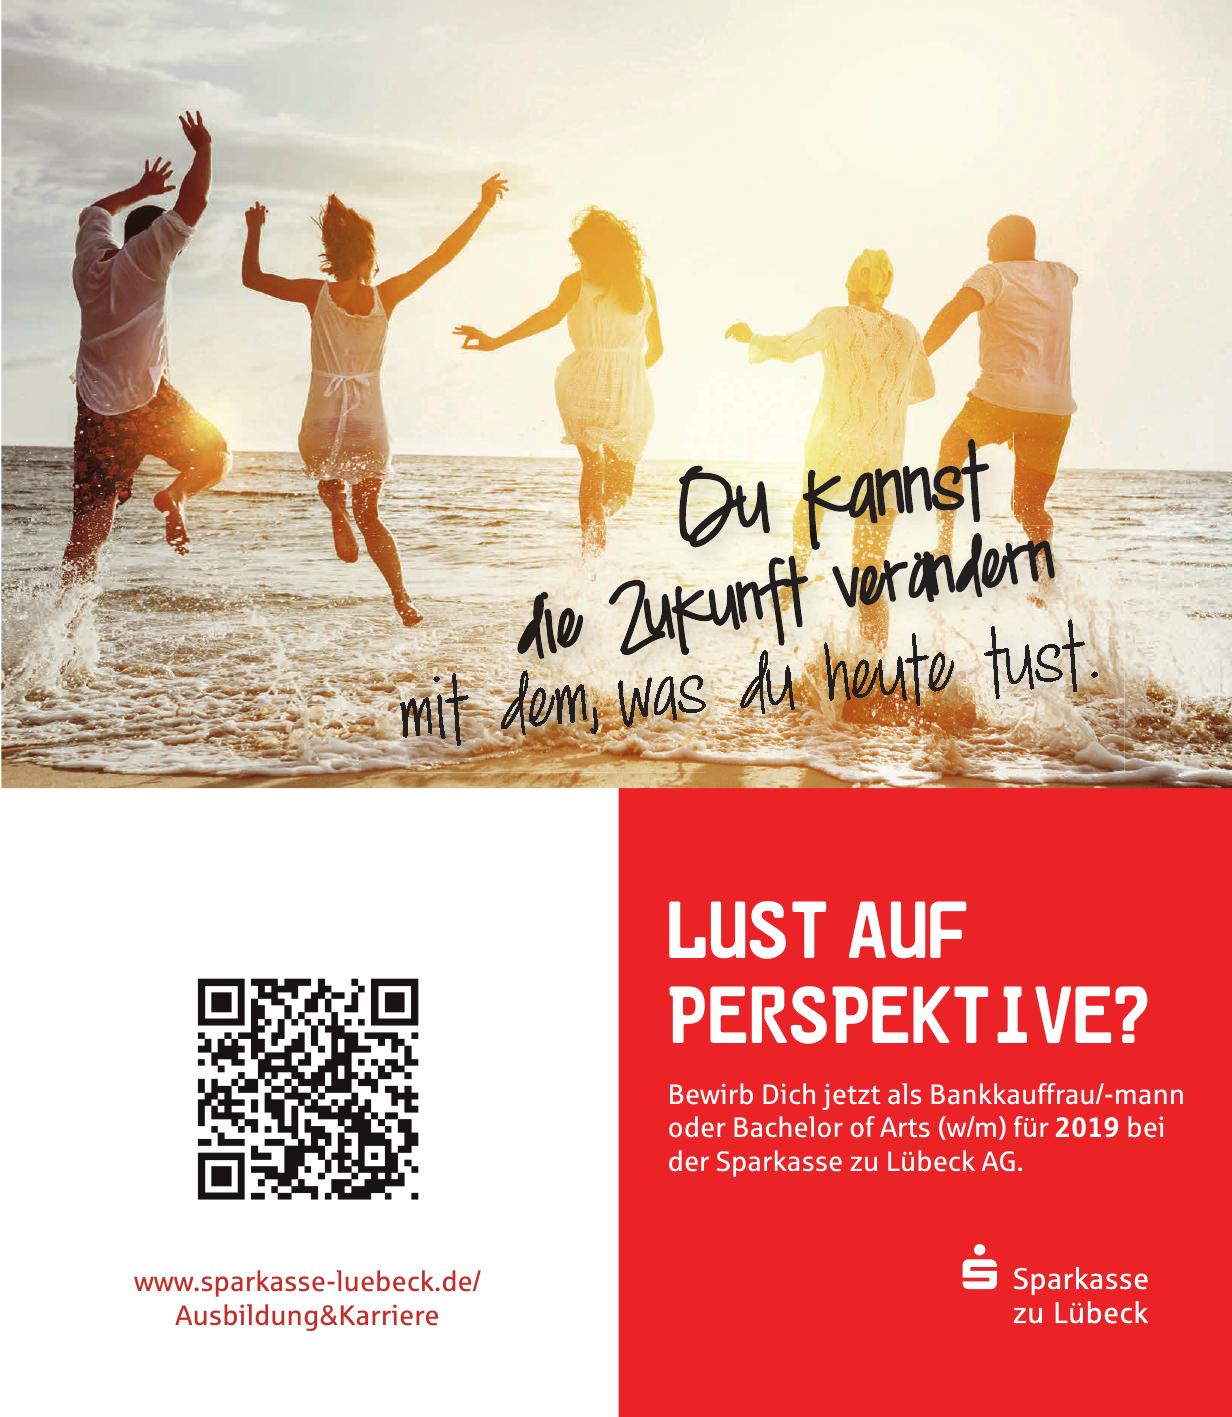 Sparkasse zu Lübeck AG